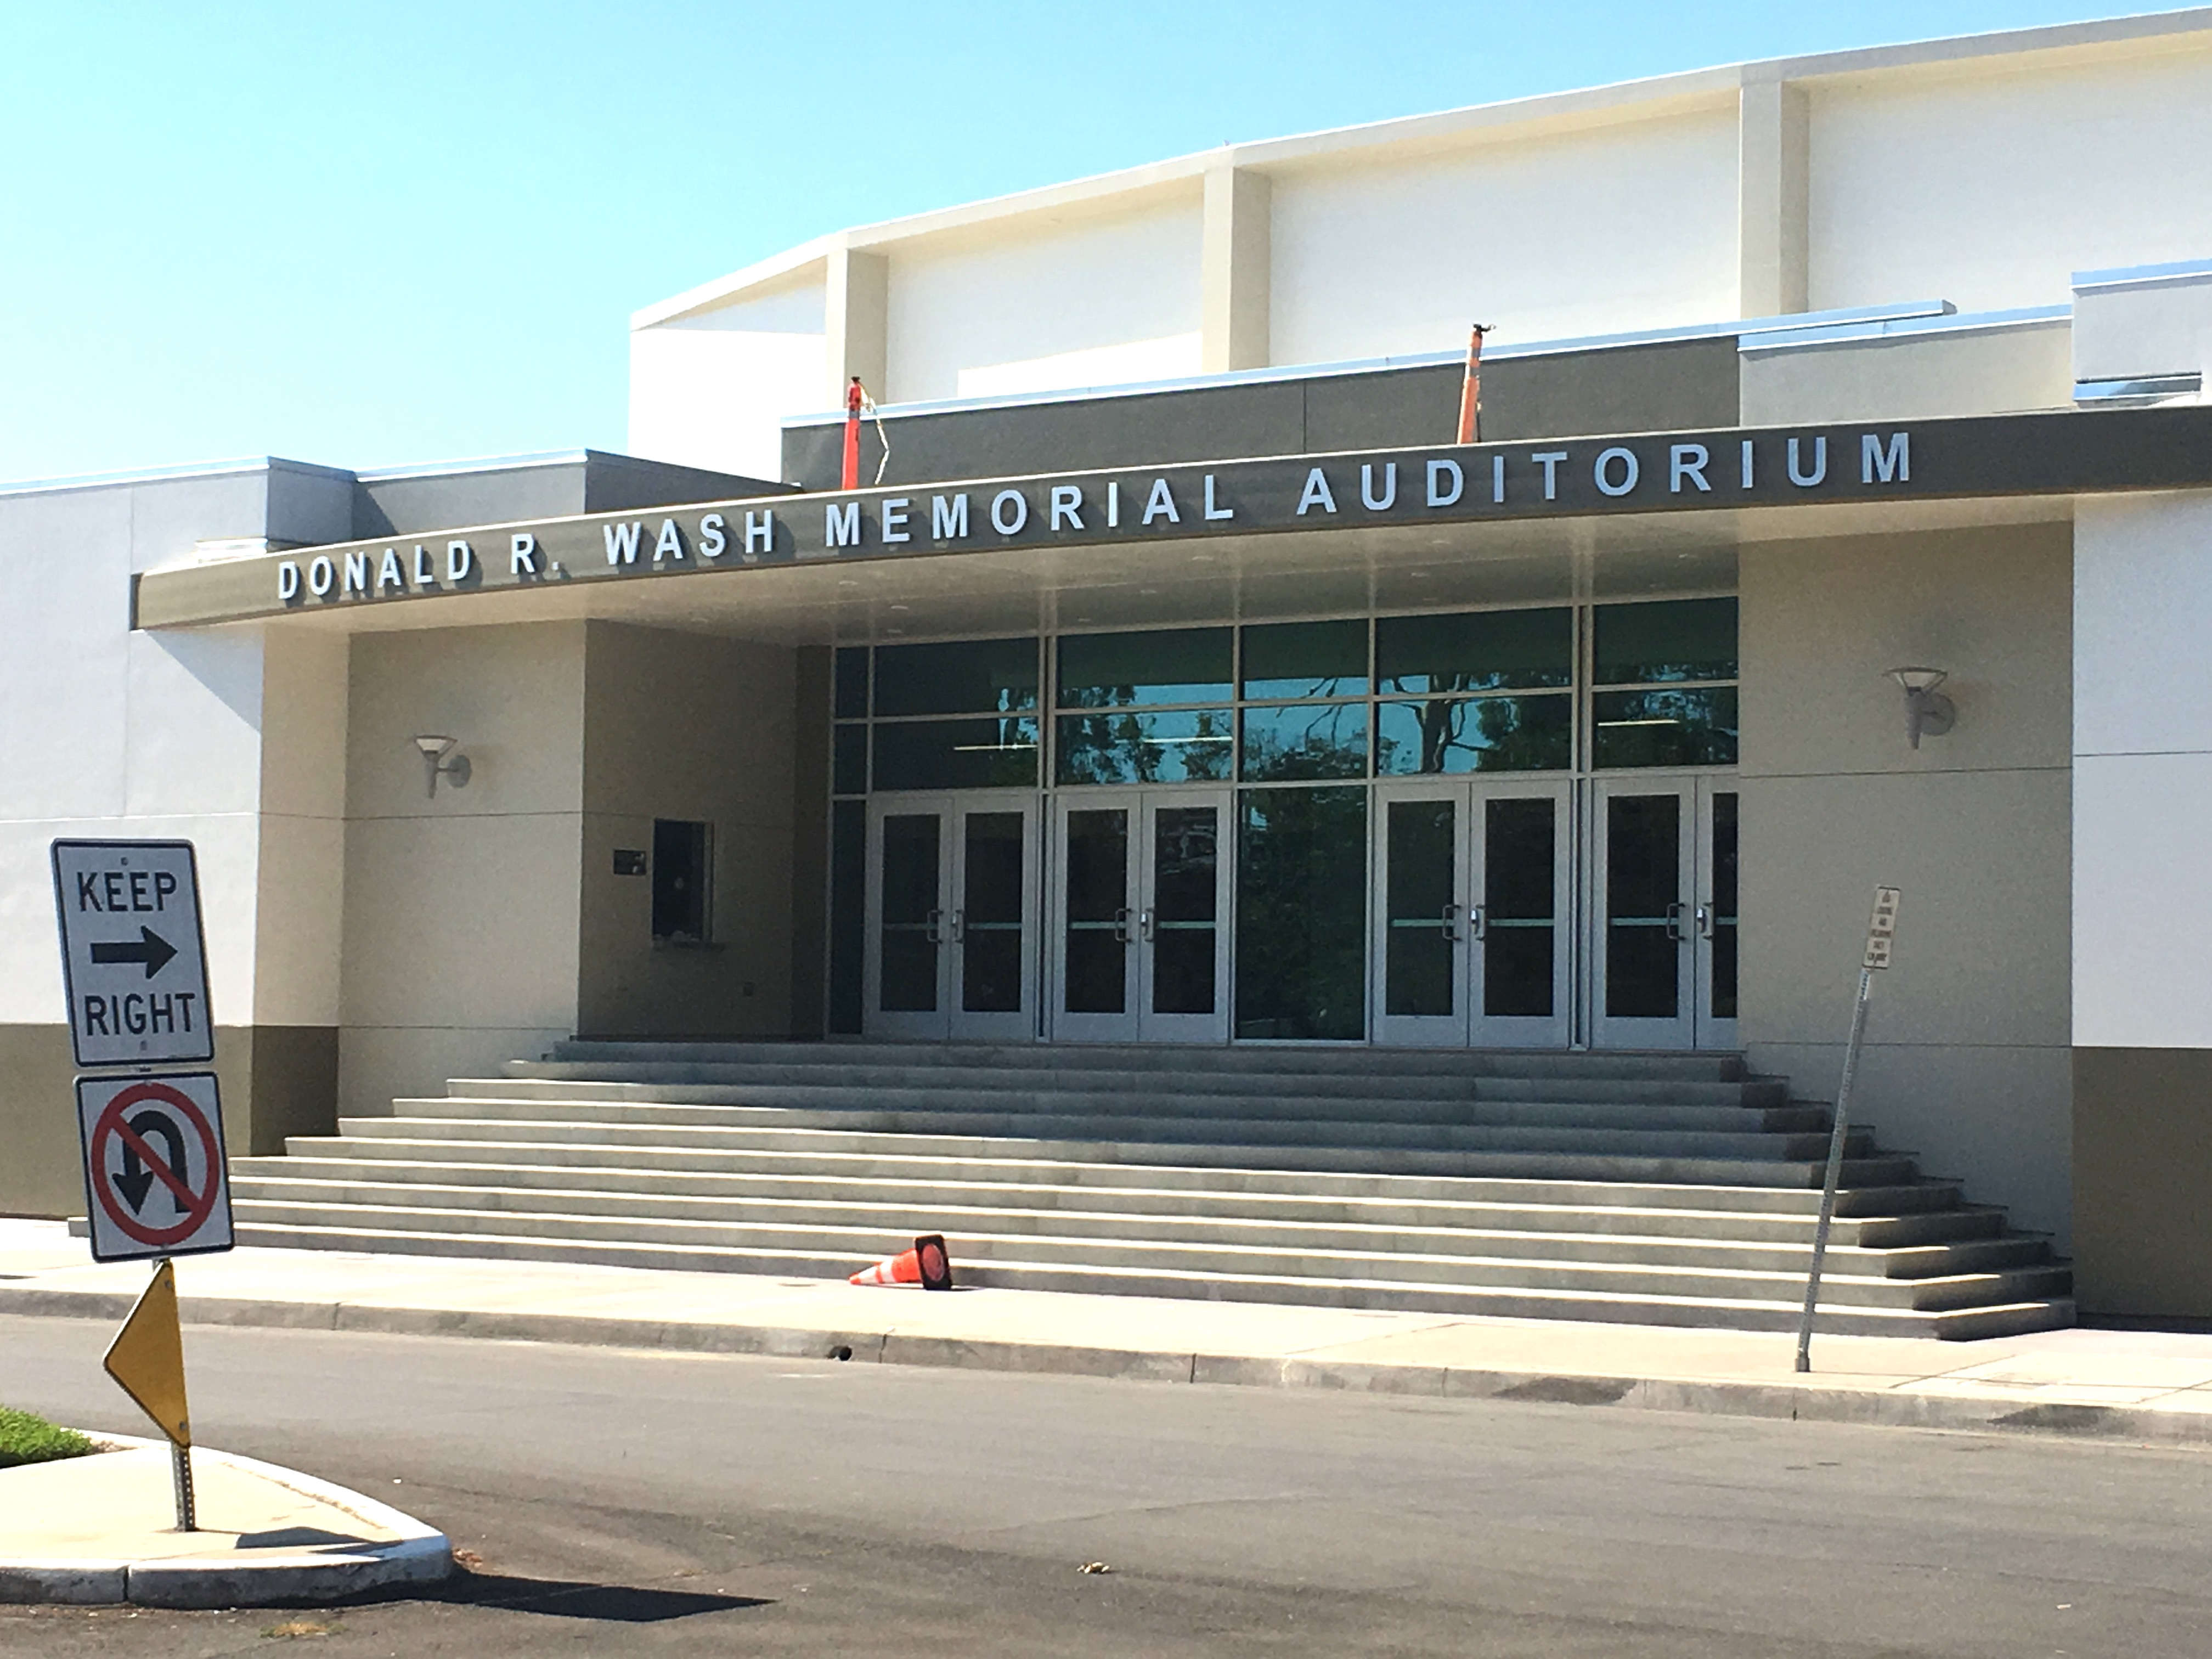 Sports facilities auditorium modernized orange county - Santiago high school garden grove ca ...